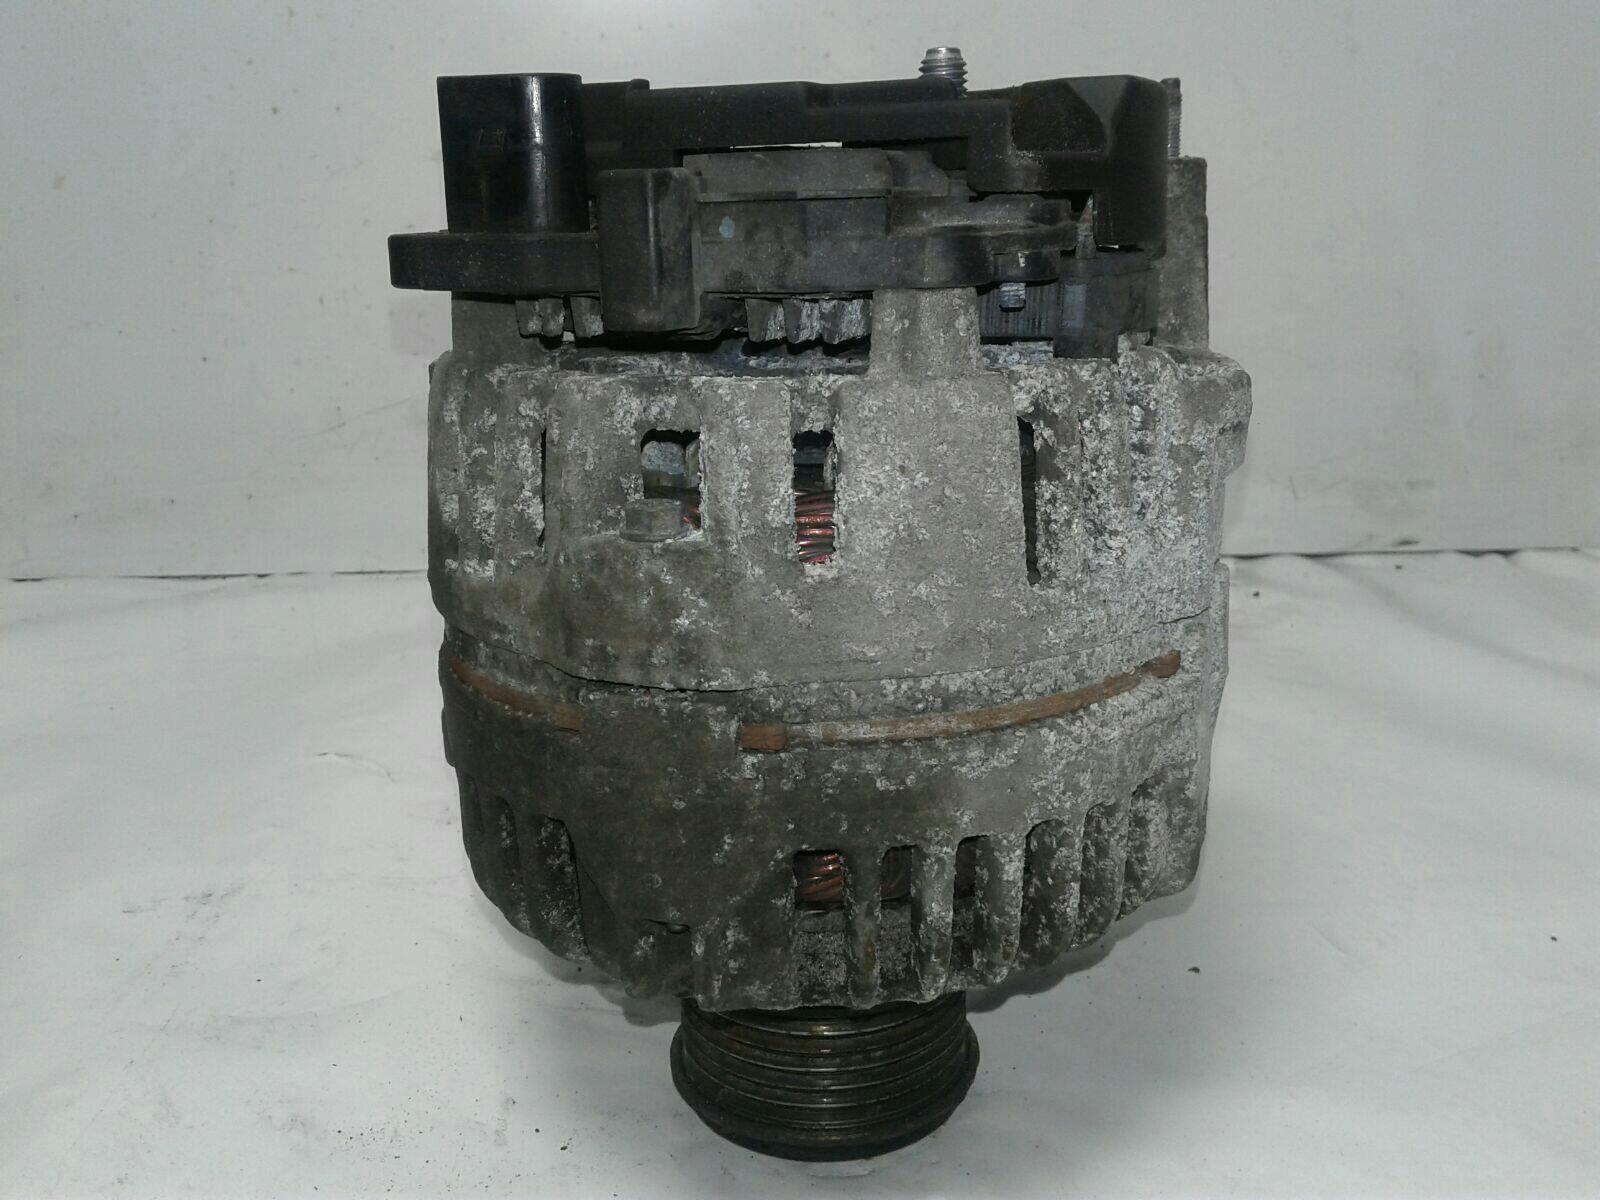 skoda fabia 2000 to 2007 alternator diesel manual for sale from rh motorhog co uk Jeep Alternator Wiring Diagram Delco Alternator Wiring Diagram